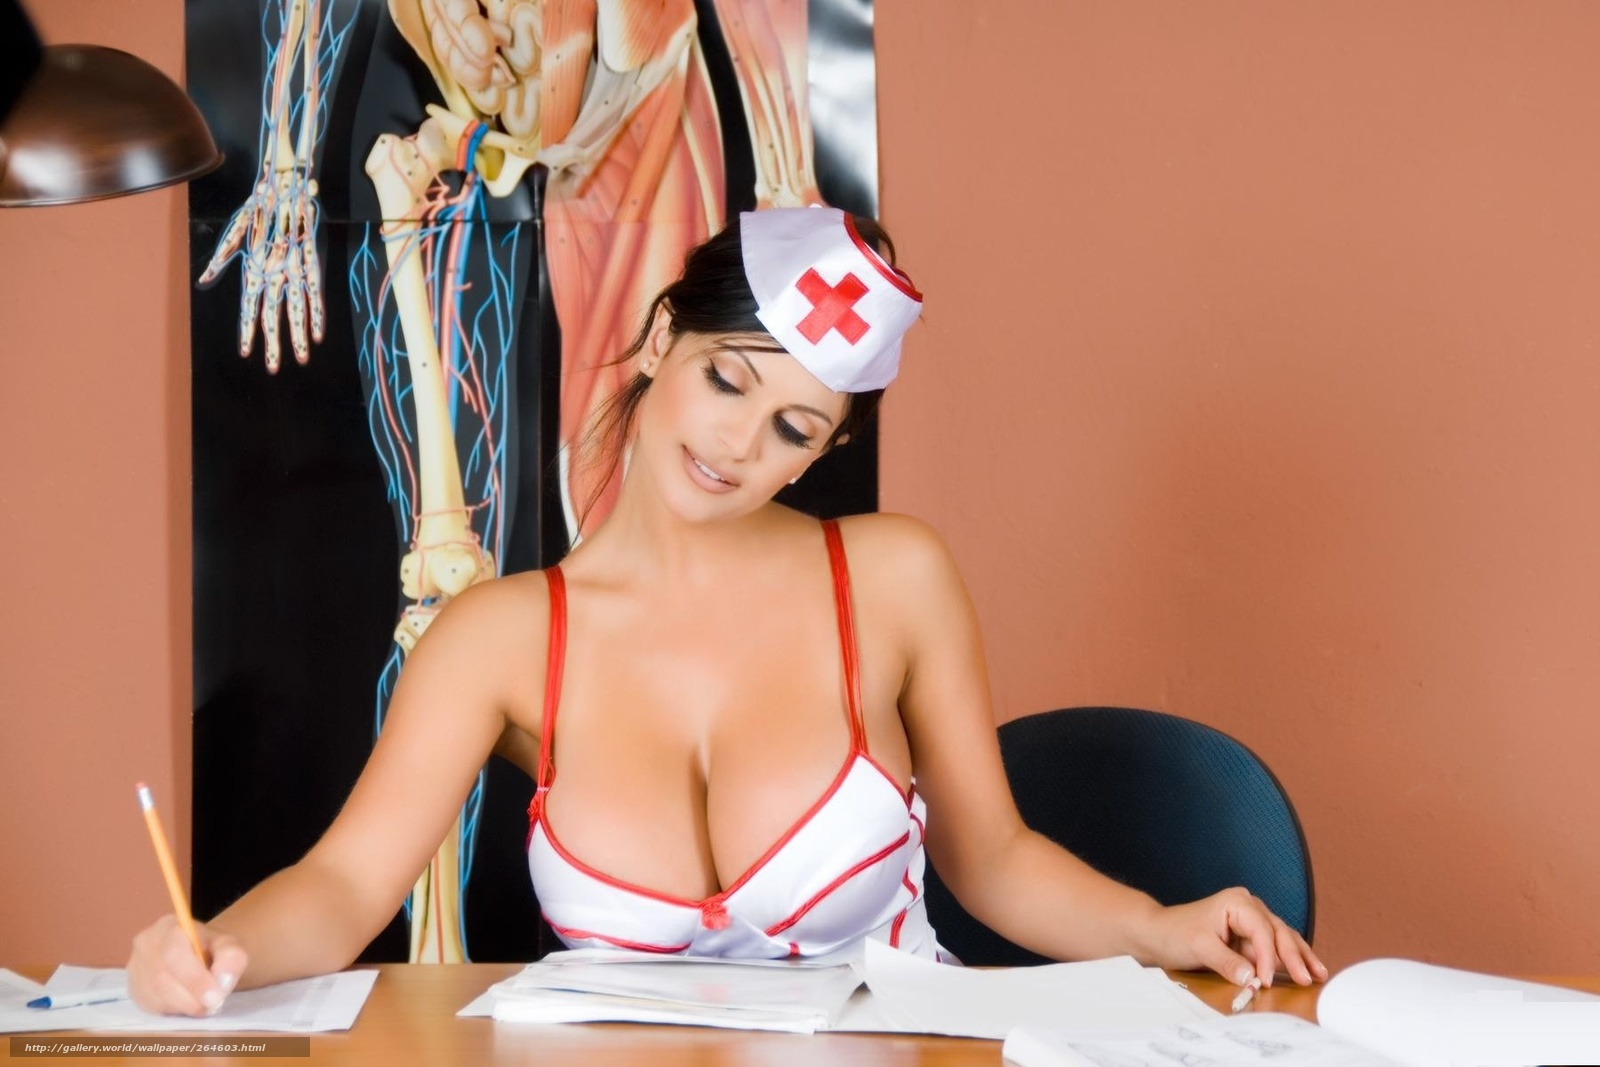 Pornpics nurse net hentay picture